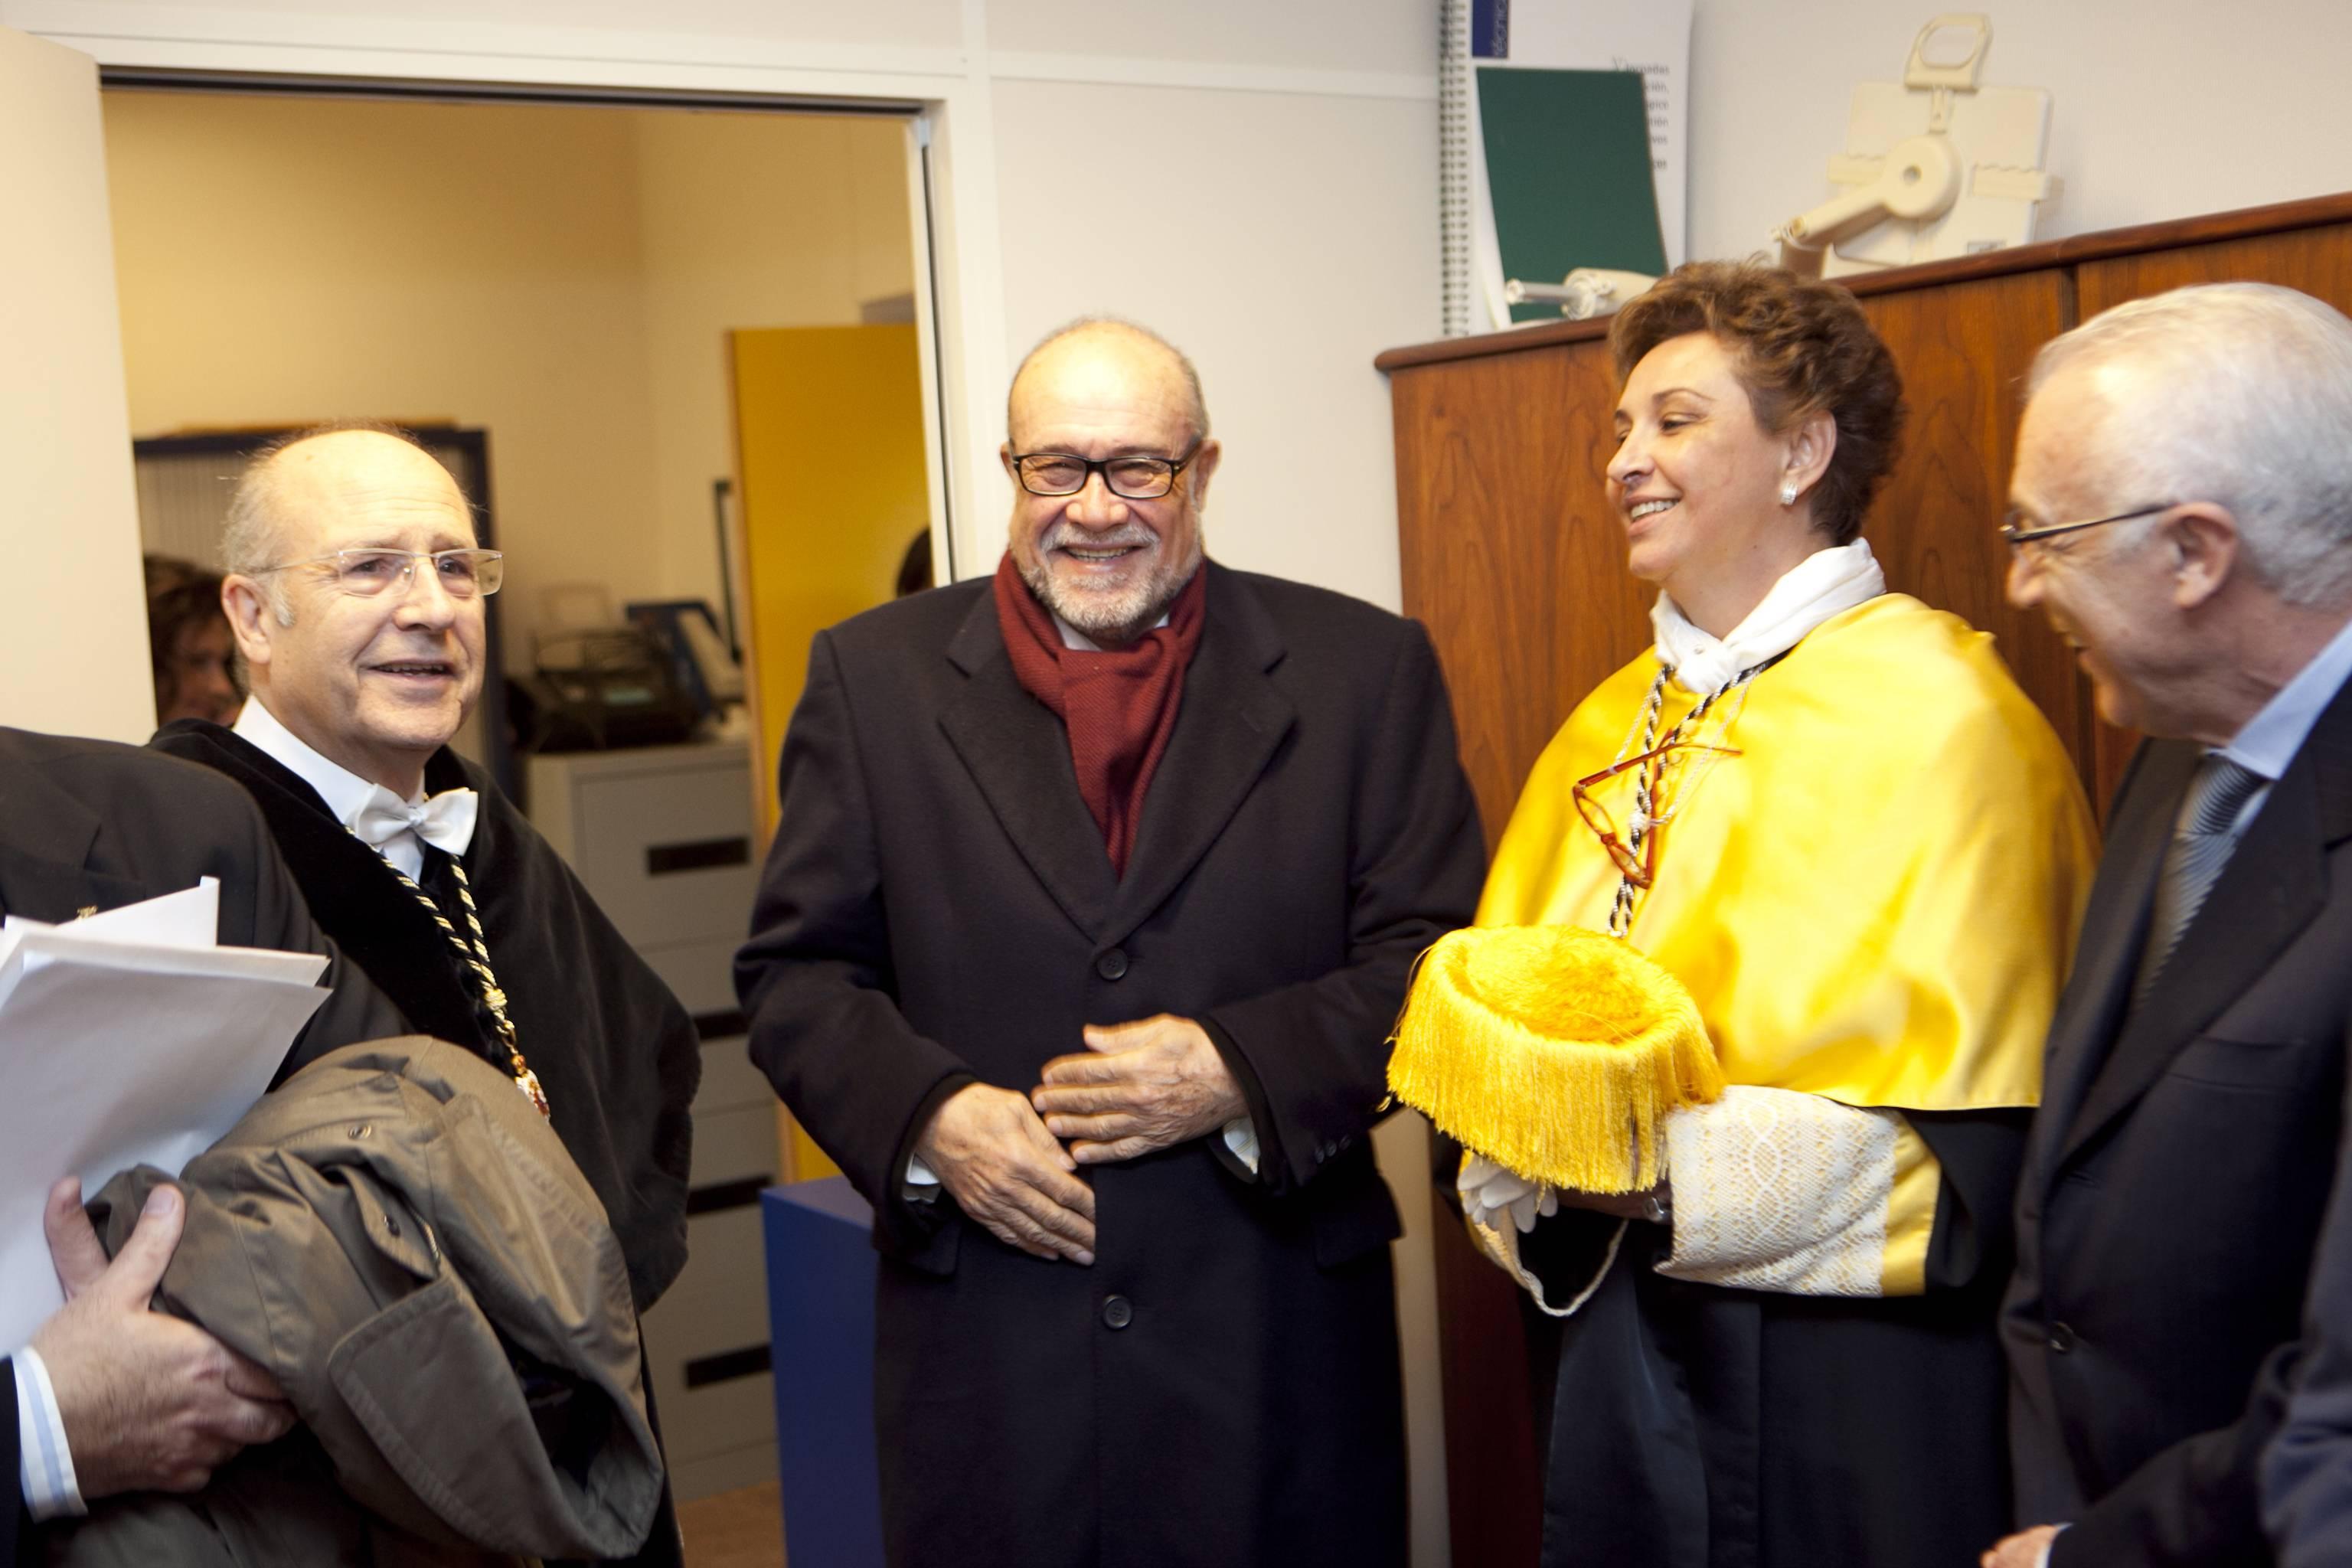 doctor-honoris-causa-luis-gamir_mg_0577.jpg